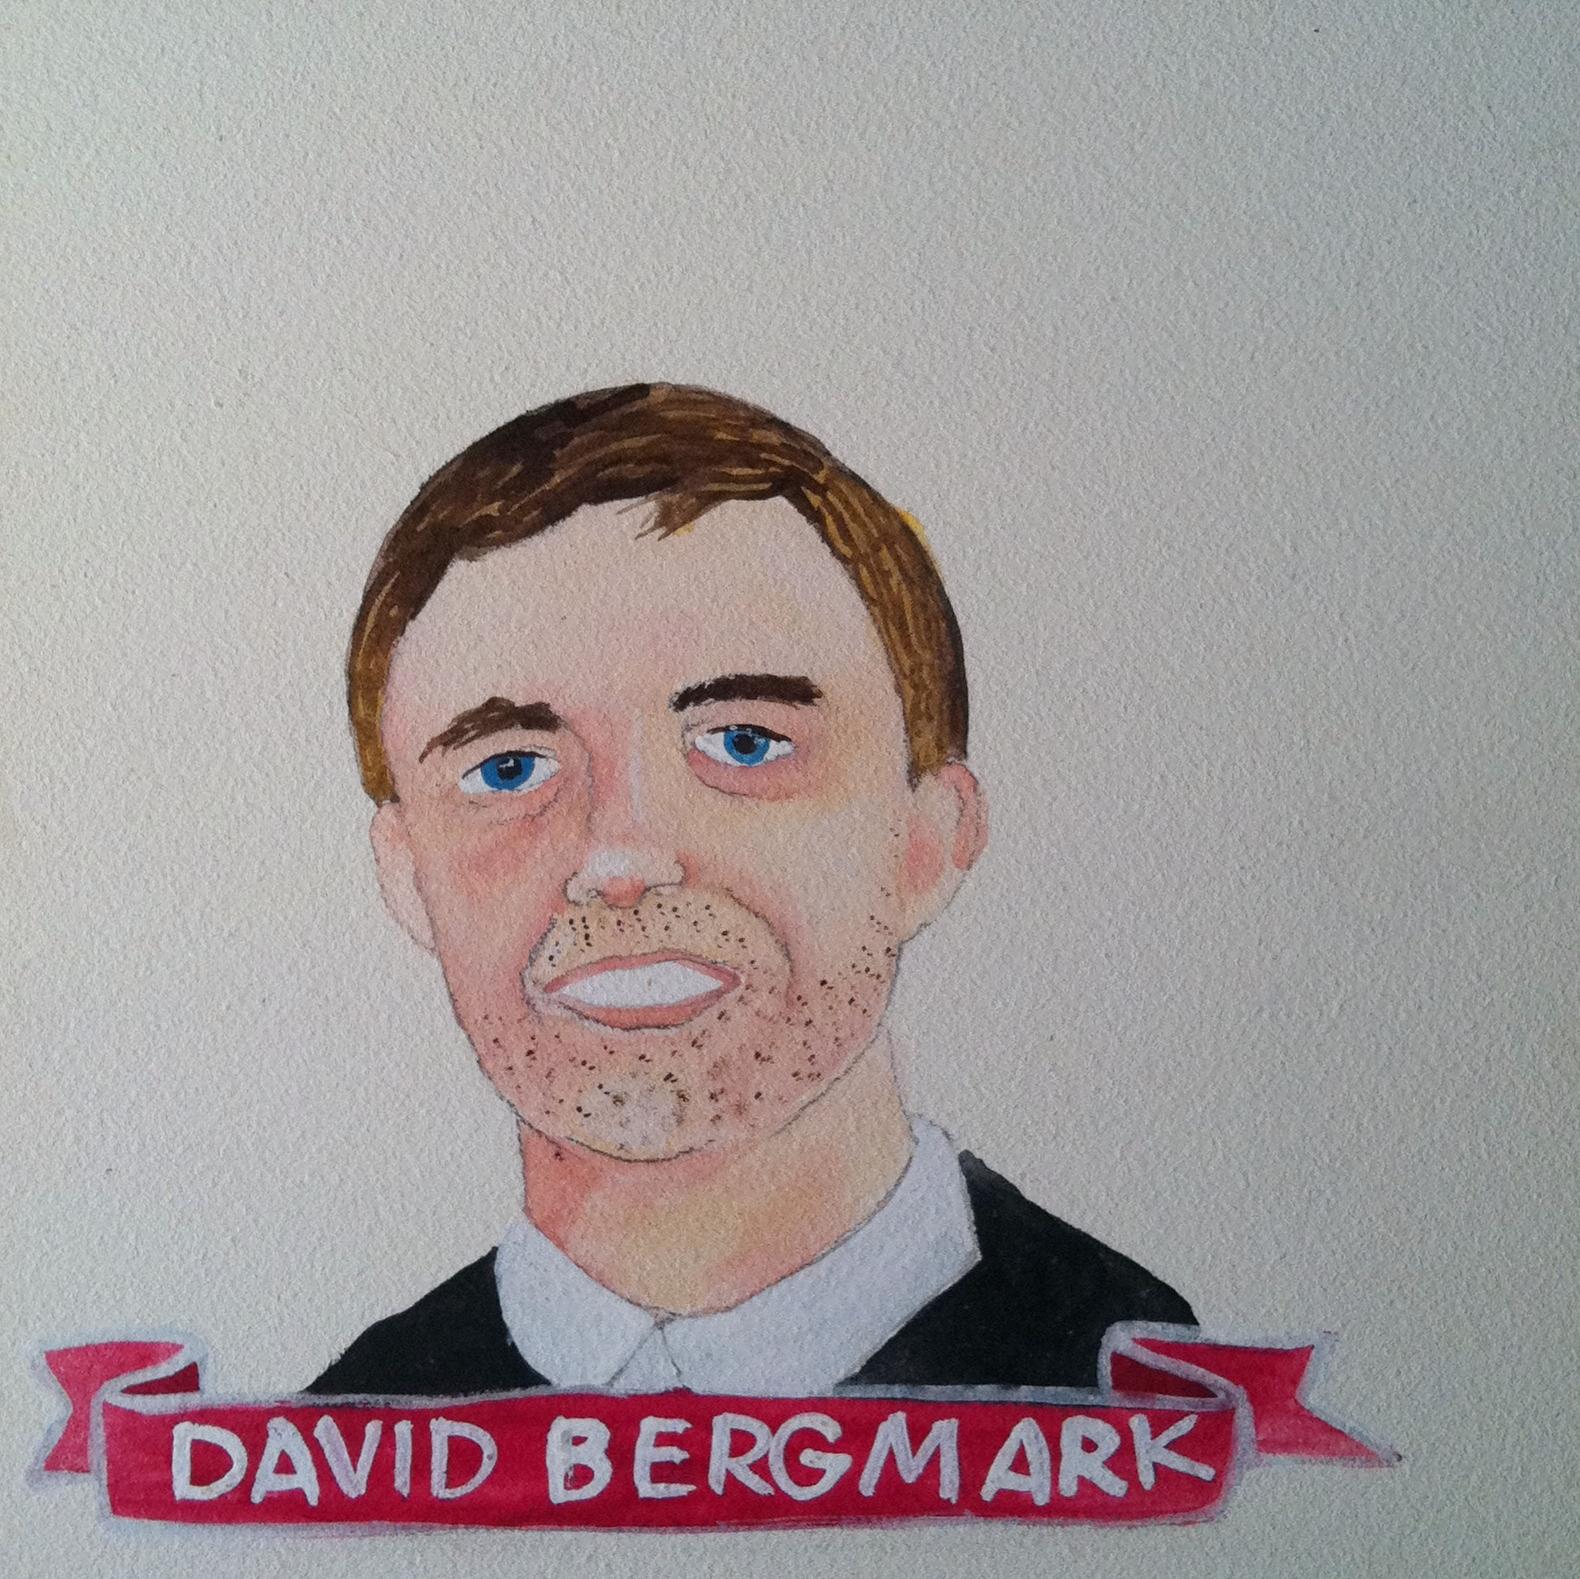 Talent Loves Company at Barbara Archer Gallery: 365 portraits by Lydia Walls - David Bergmark